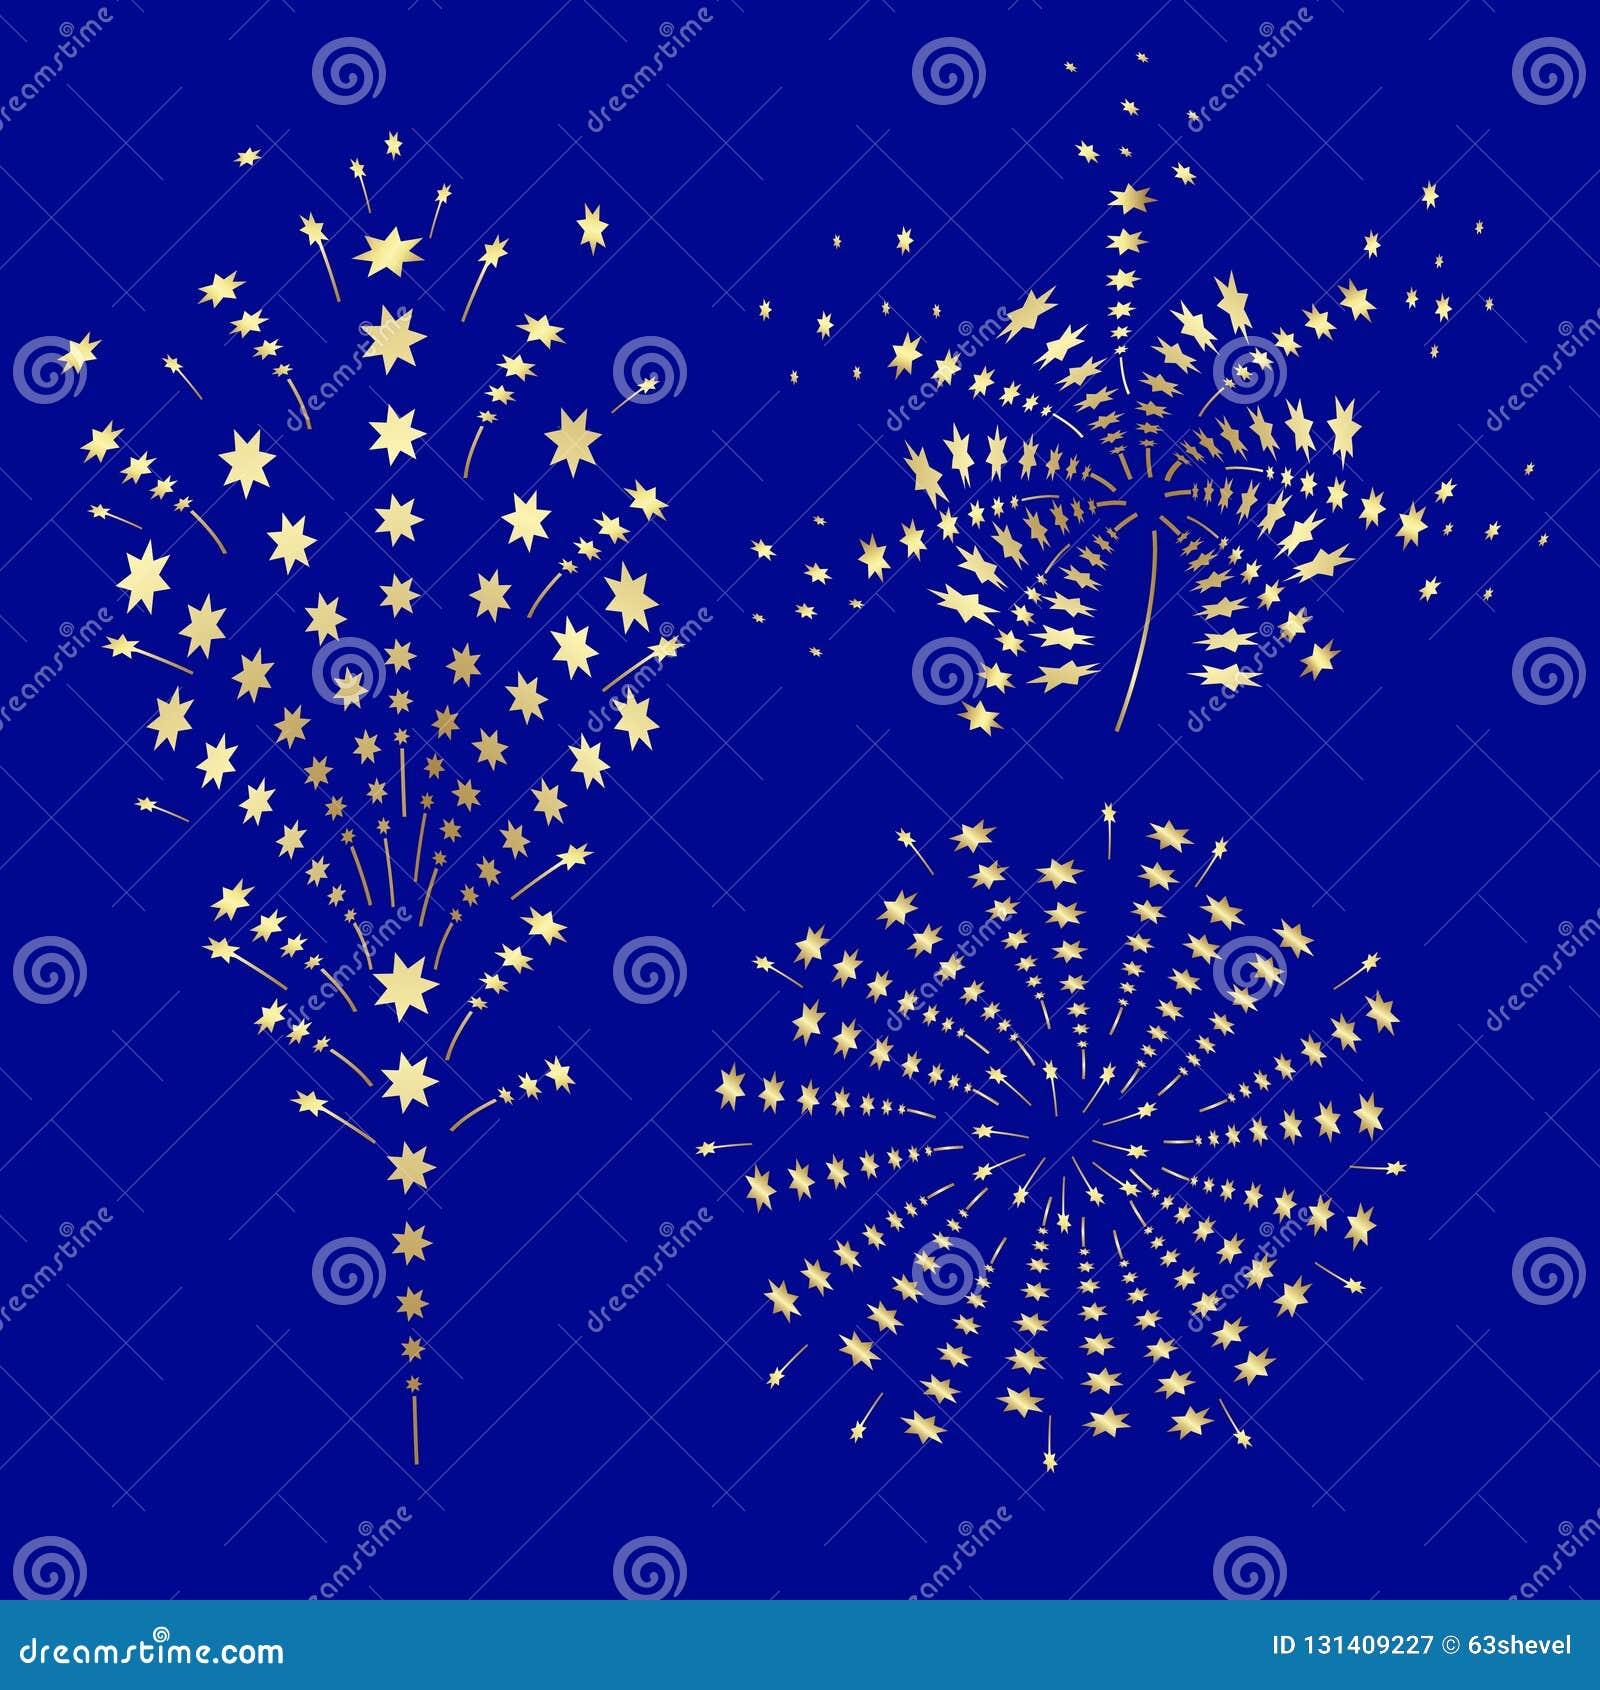 A Set Of Golden Festive Fireworks  Stock Vector